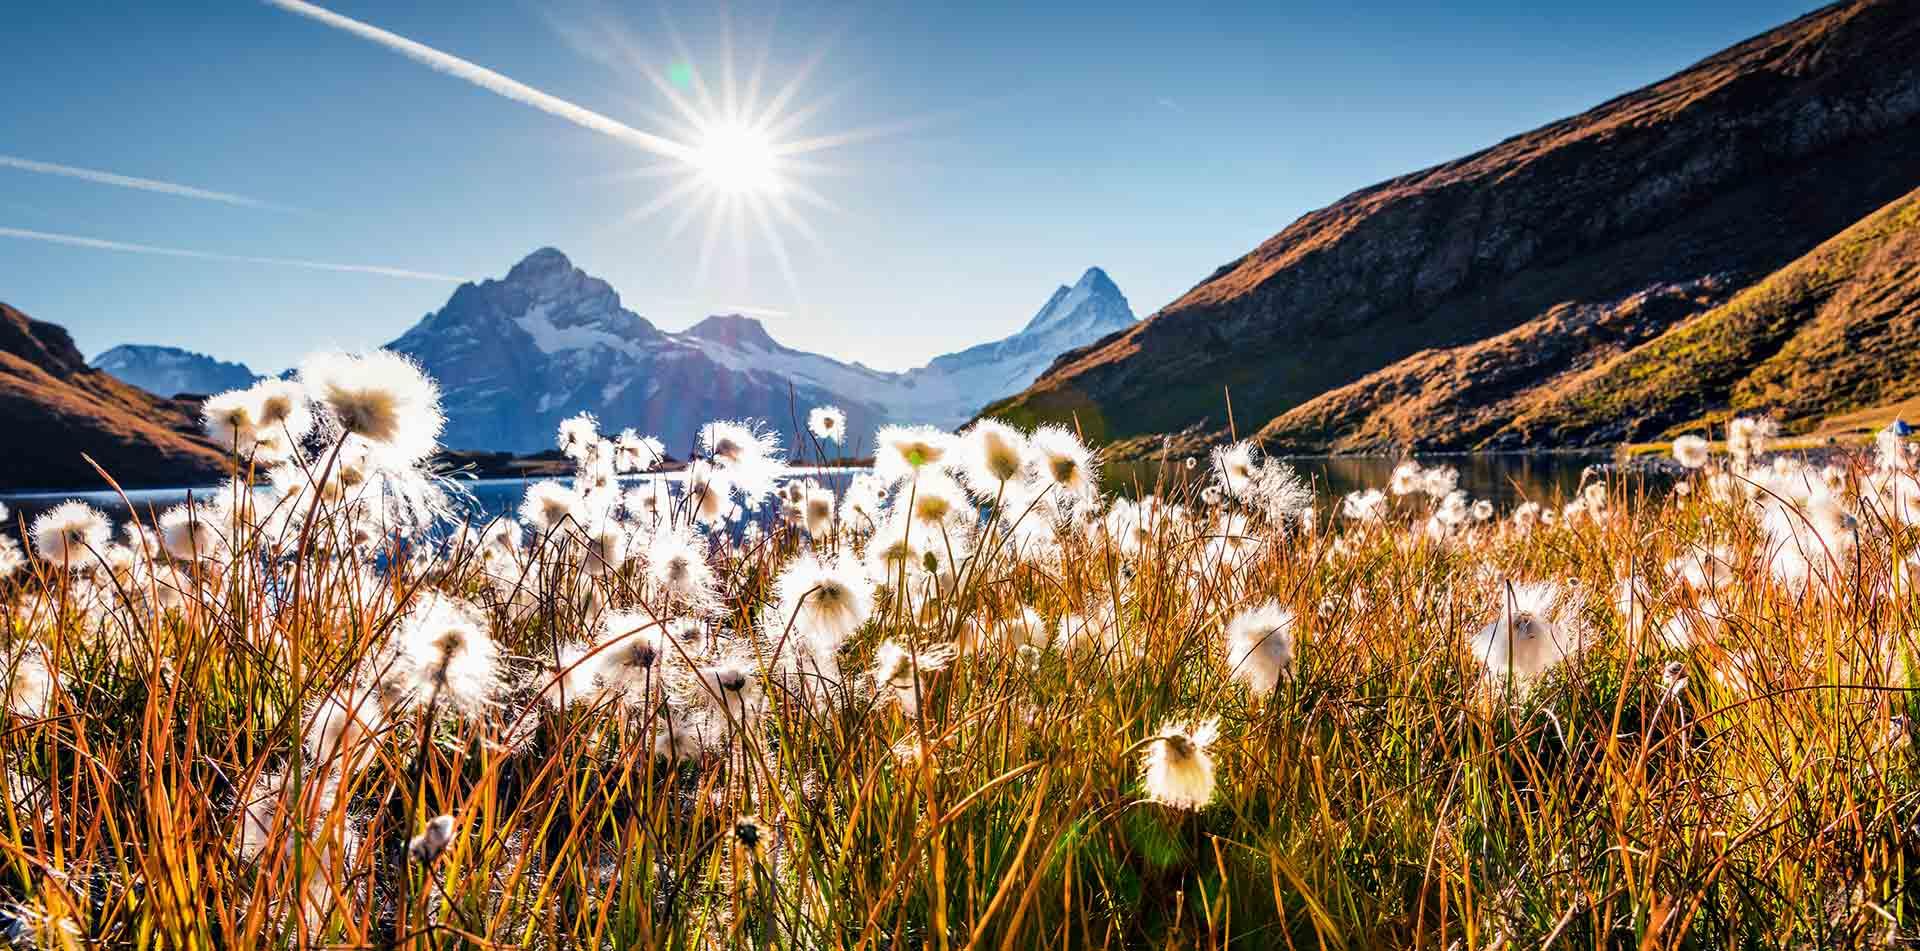 Sunny morning scene Bachalp Lake, Swiss Alps